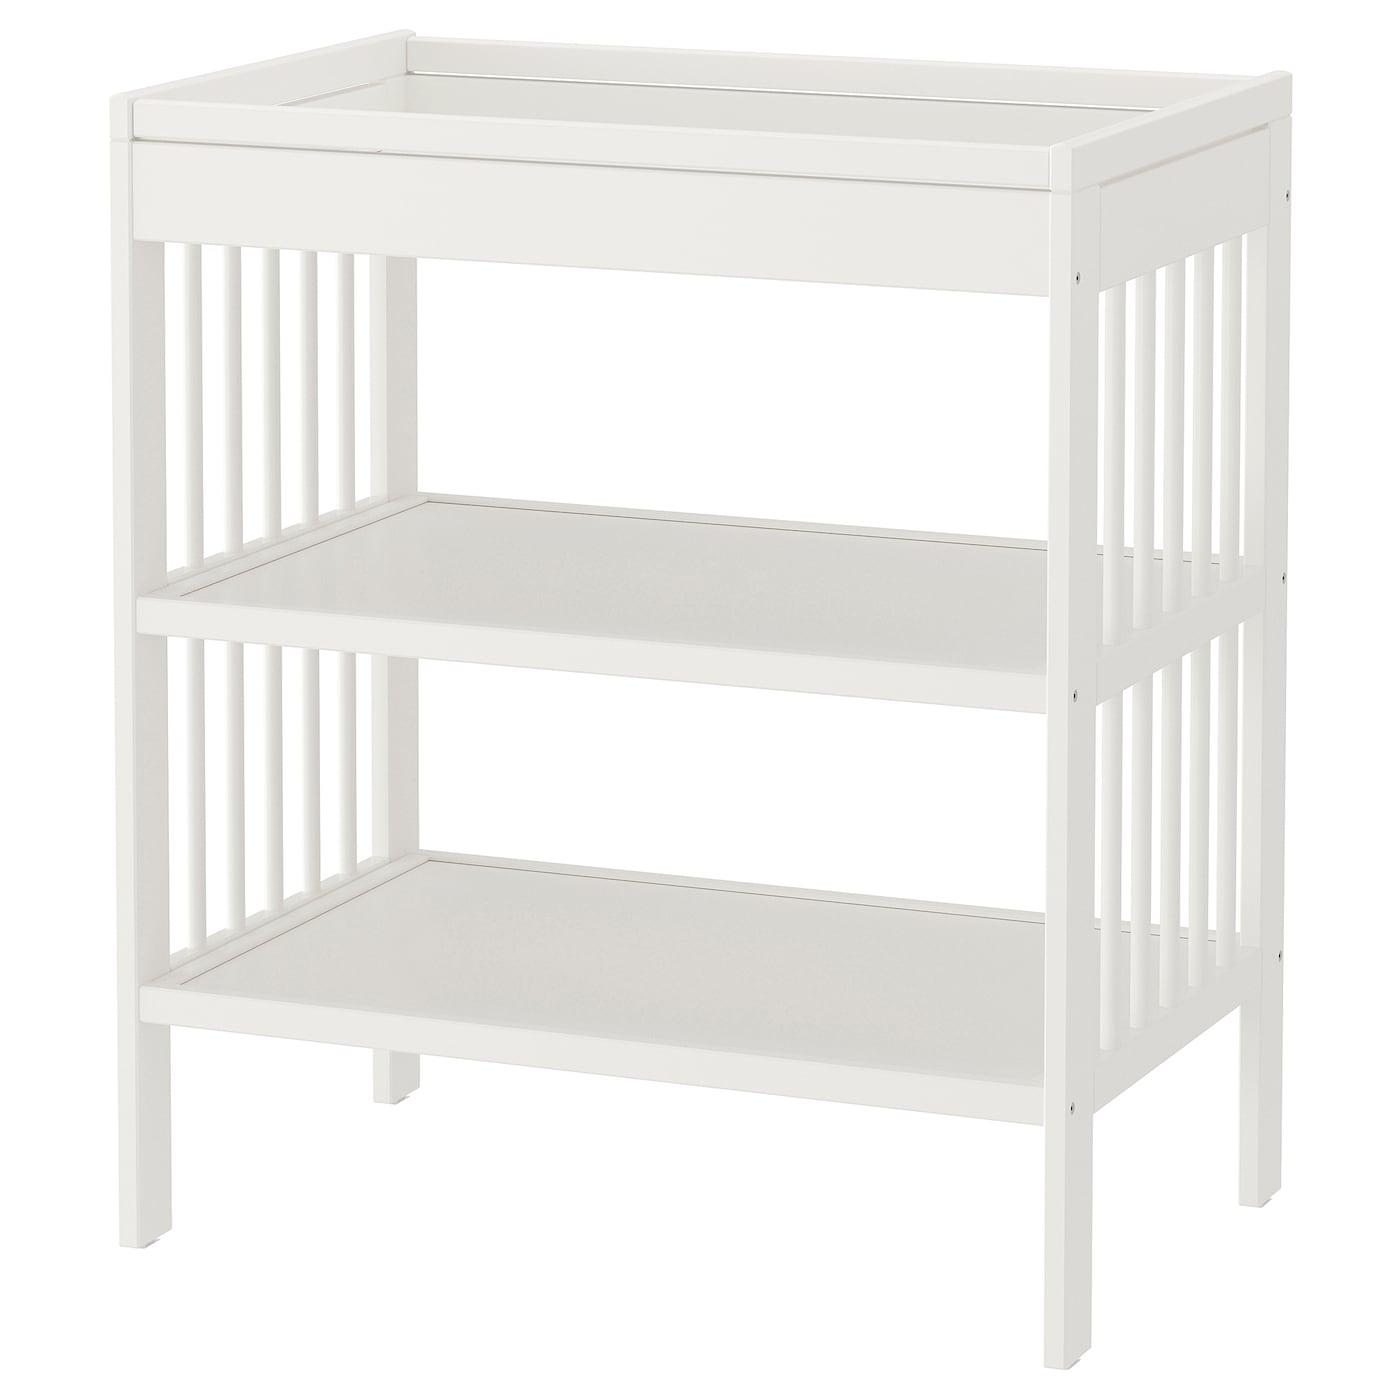 table langer sac matelas coussin baignoire b b ikea. Black Bedroom Furniture Sets. Home Design Ideas